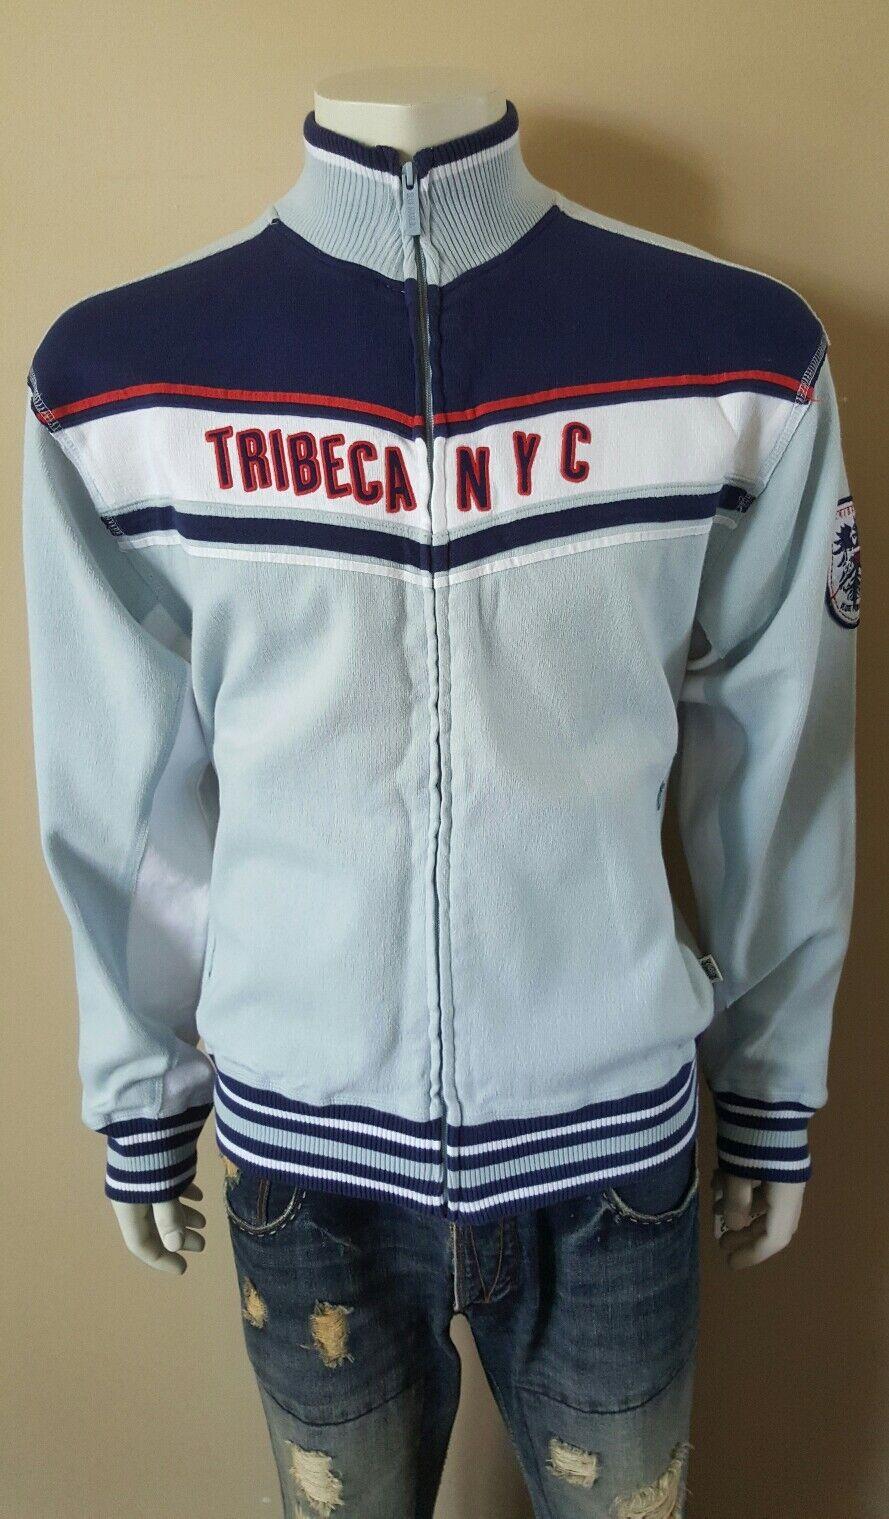 $79 Nwt Blue Marlin VintageTribeca NY Baseball Argentina Soccor Jacket Large